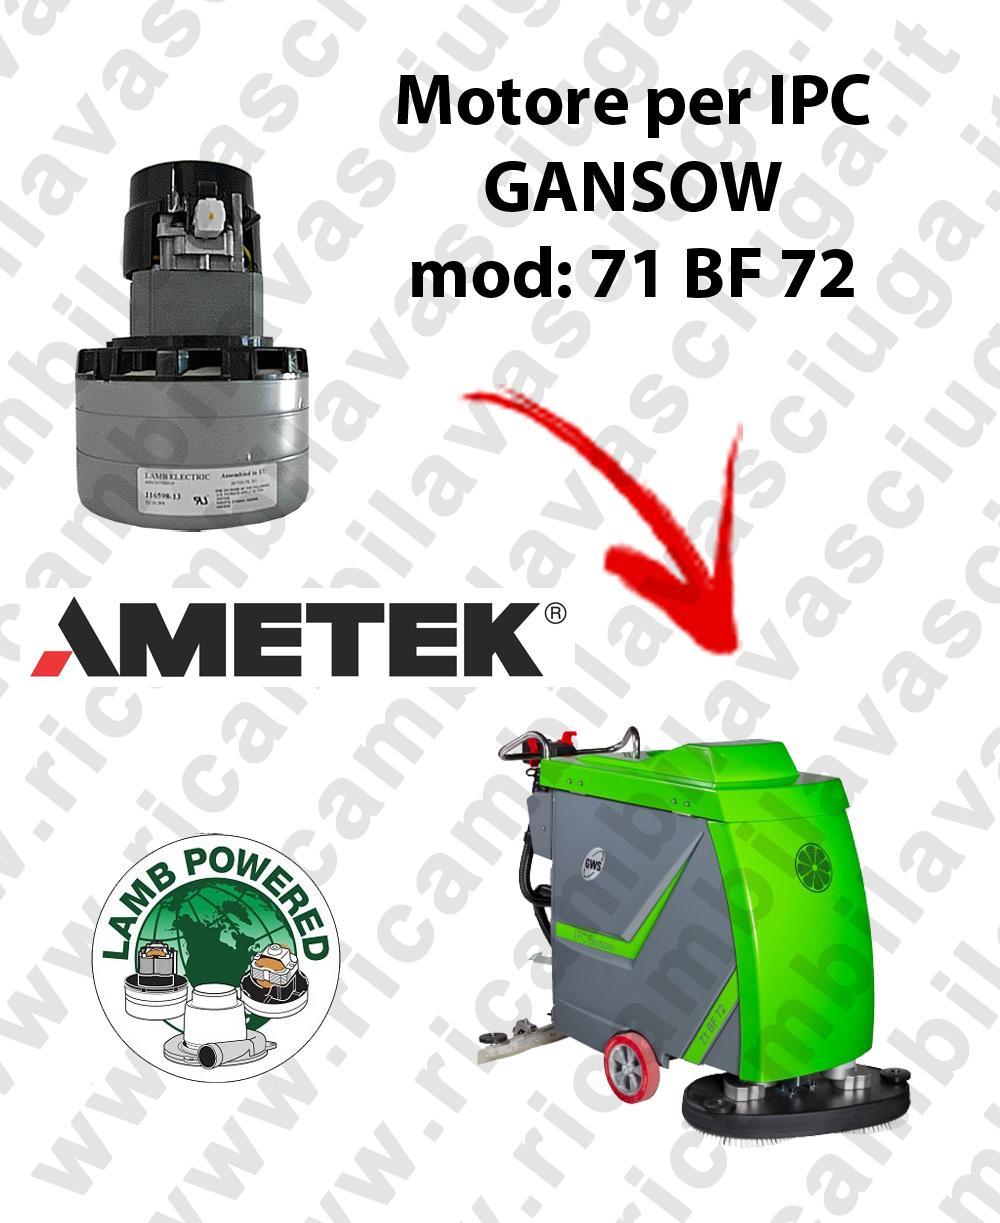 71 BF 72 MOTORE LAMB AMETEK di aspirazione per lavapavimenti IPC GANSOW